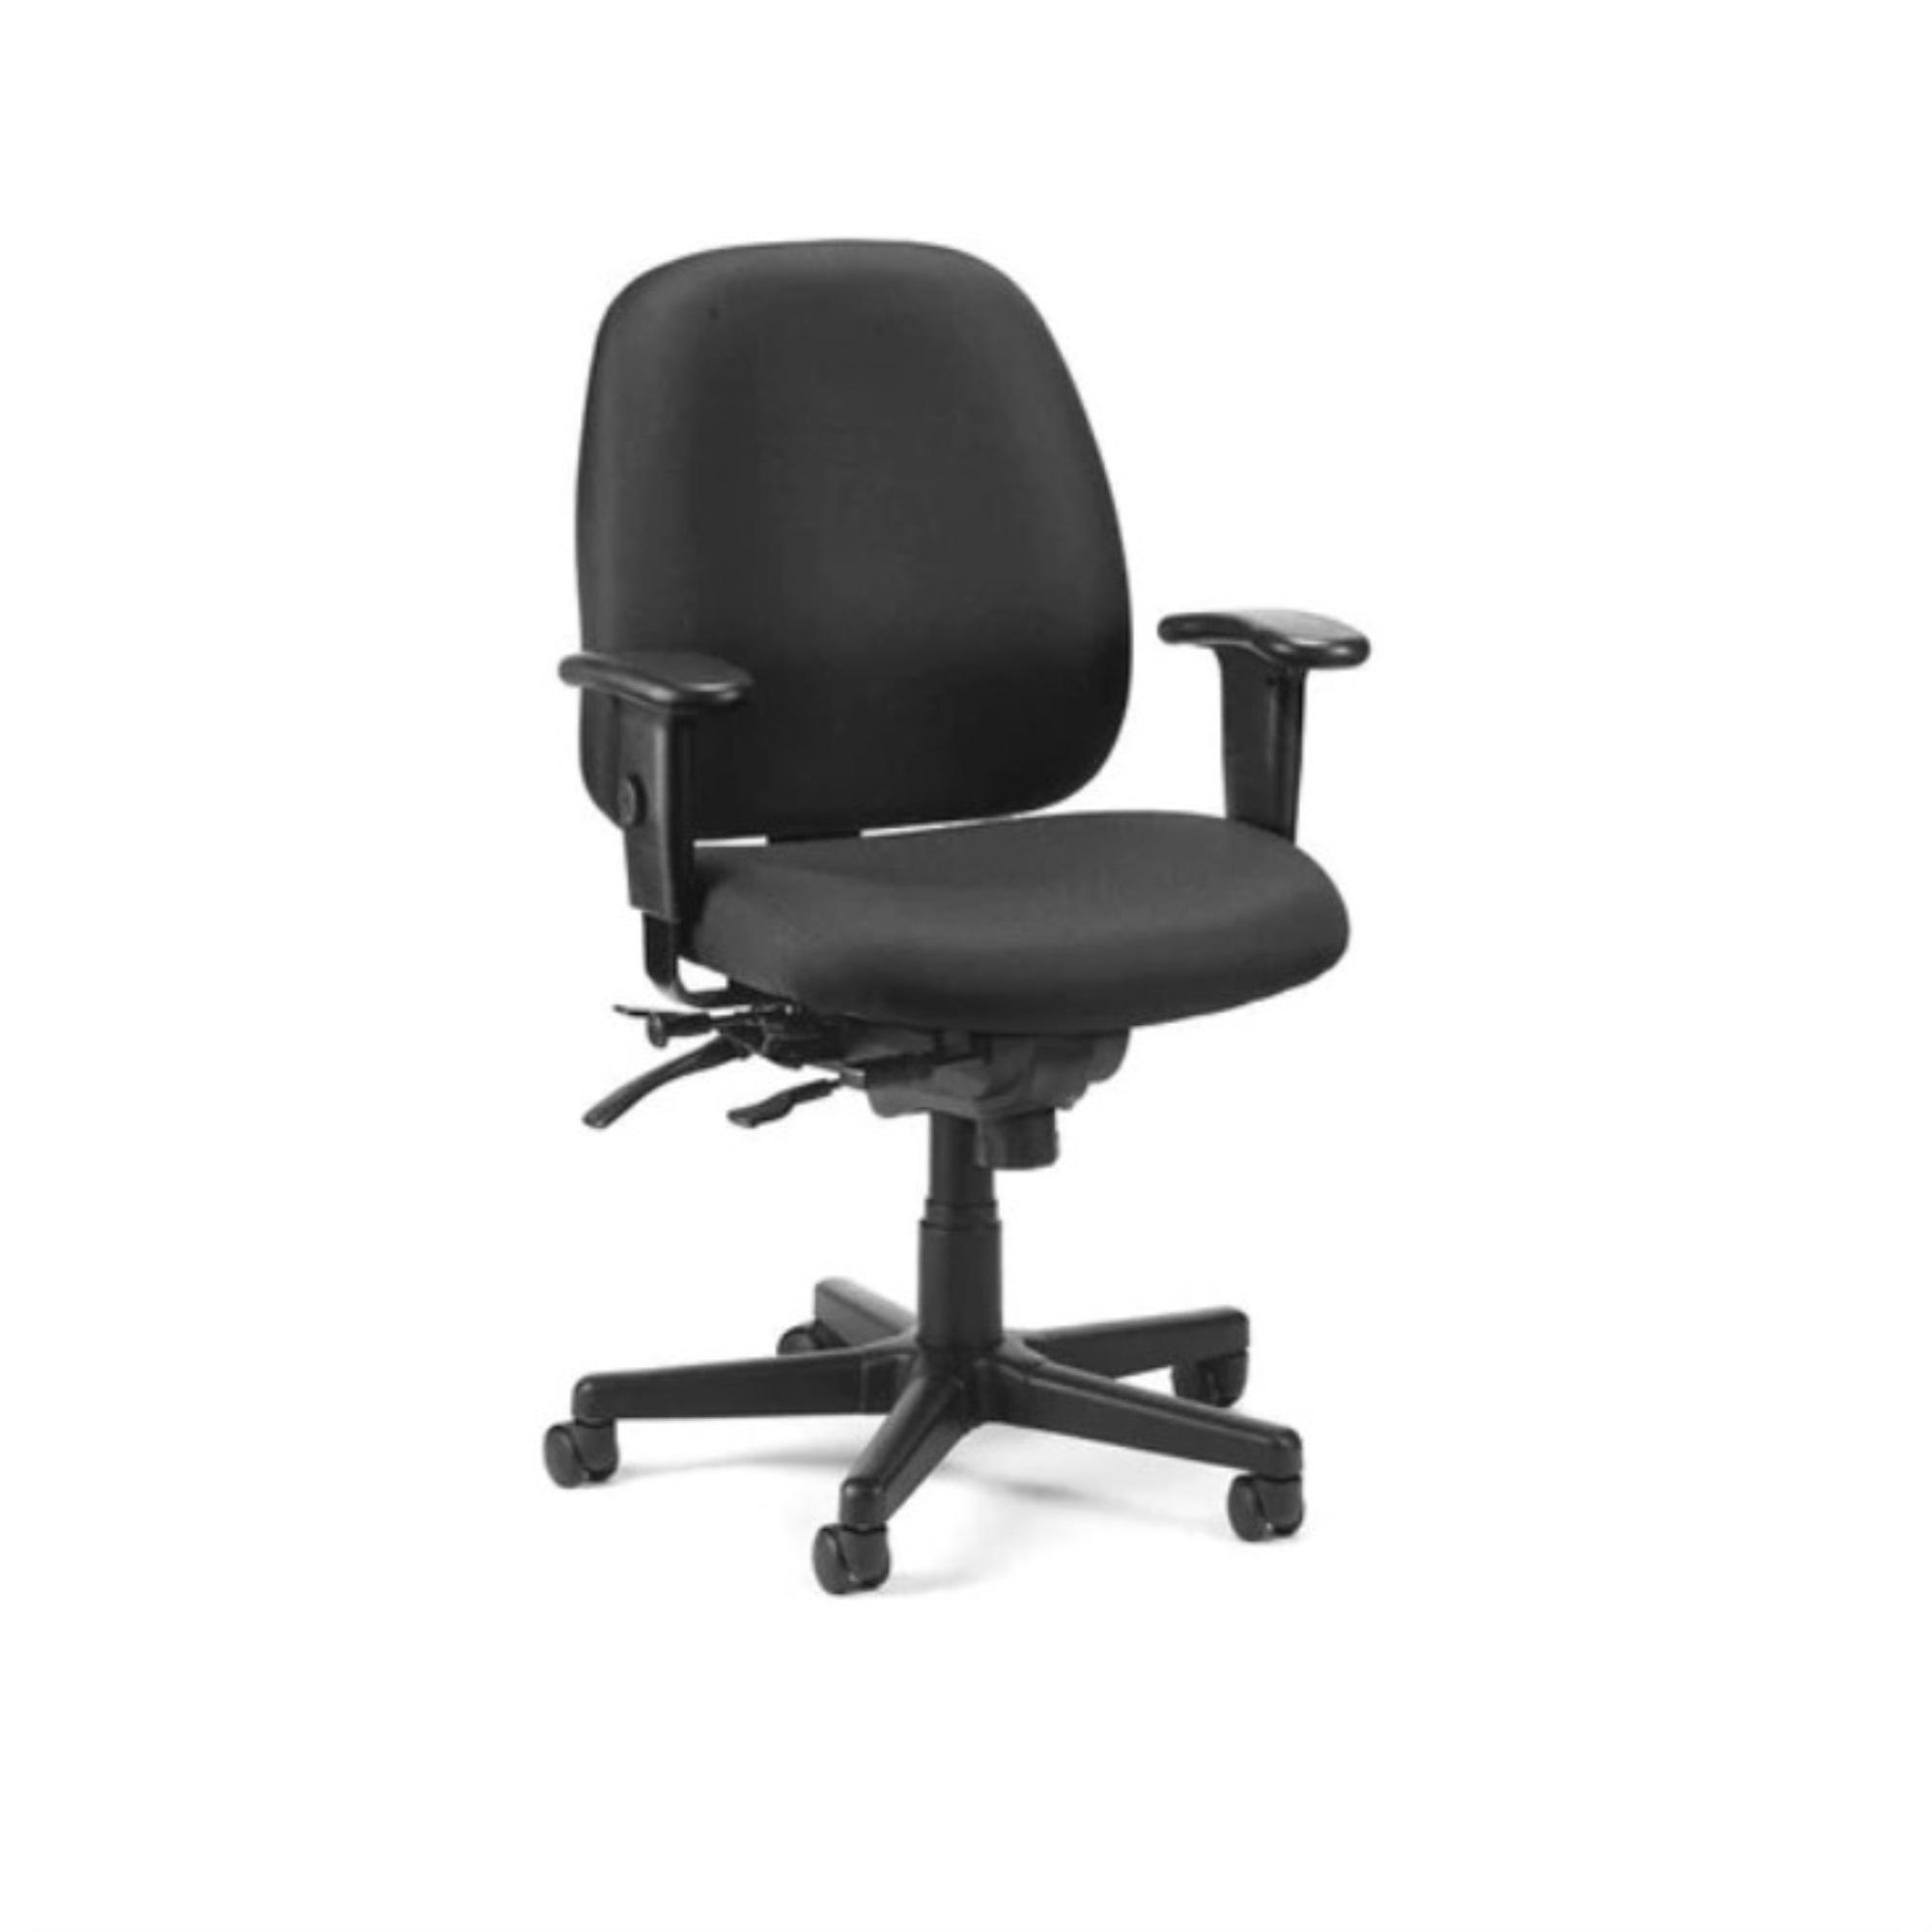 "29.5"" x 26"" x 37"" Charcoal Fabric Seat Slider Swivel"